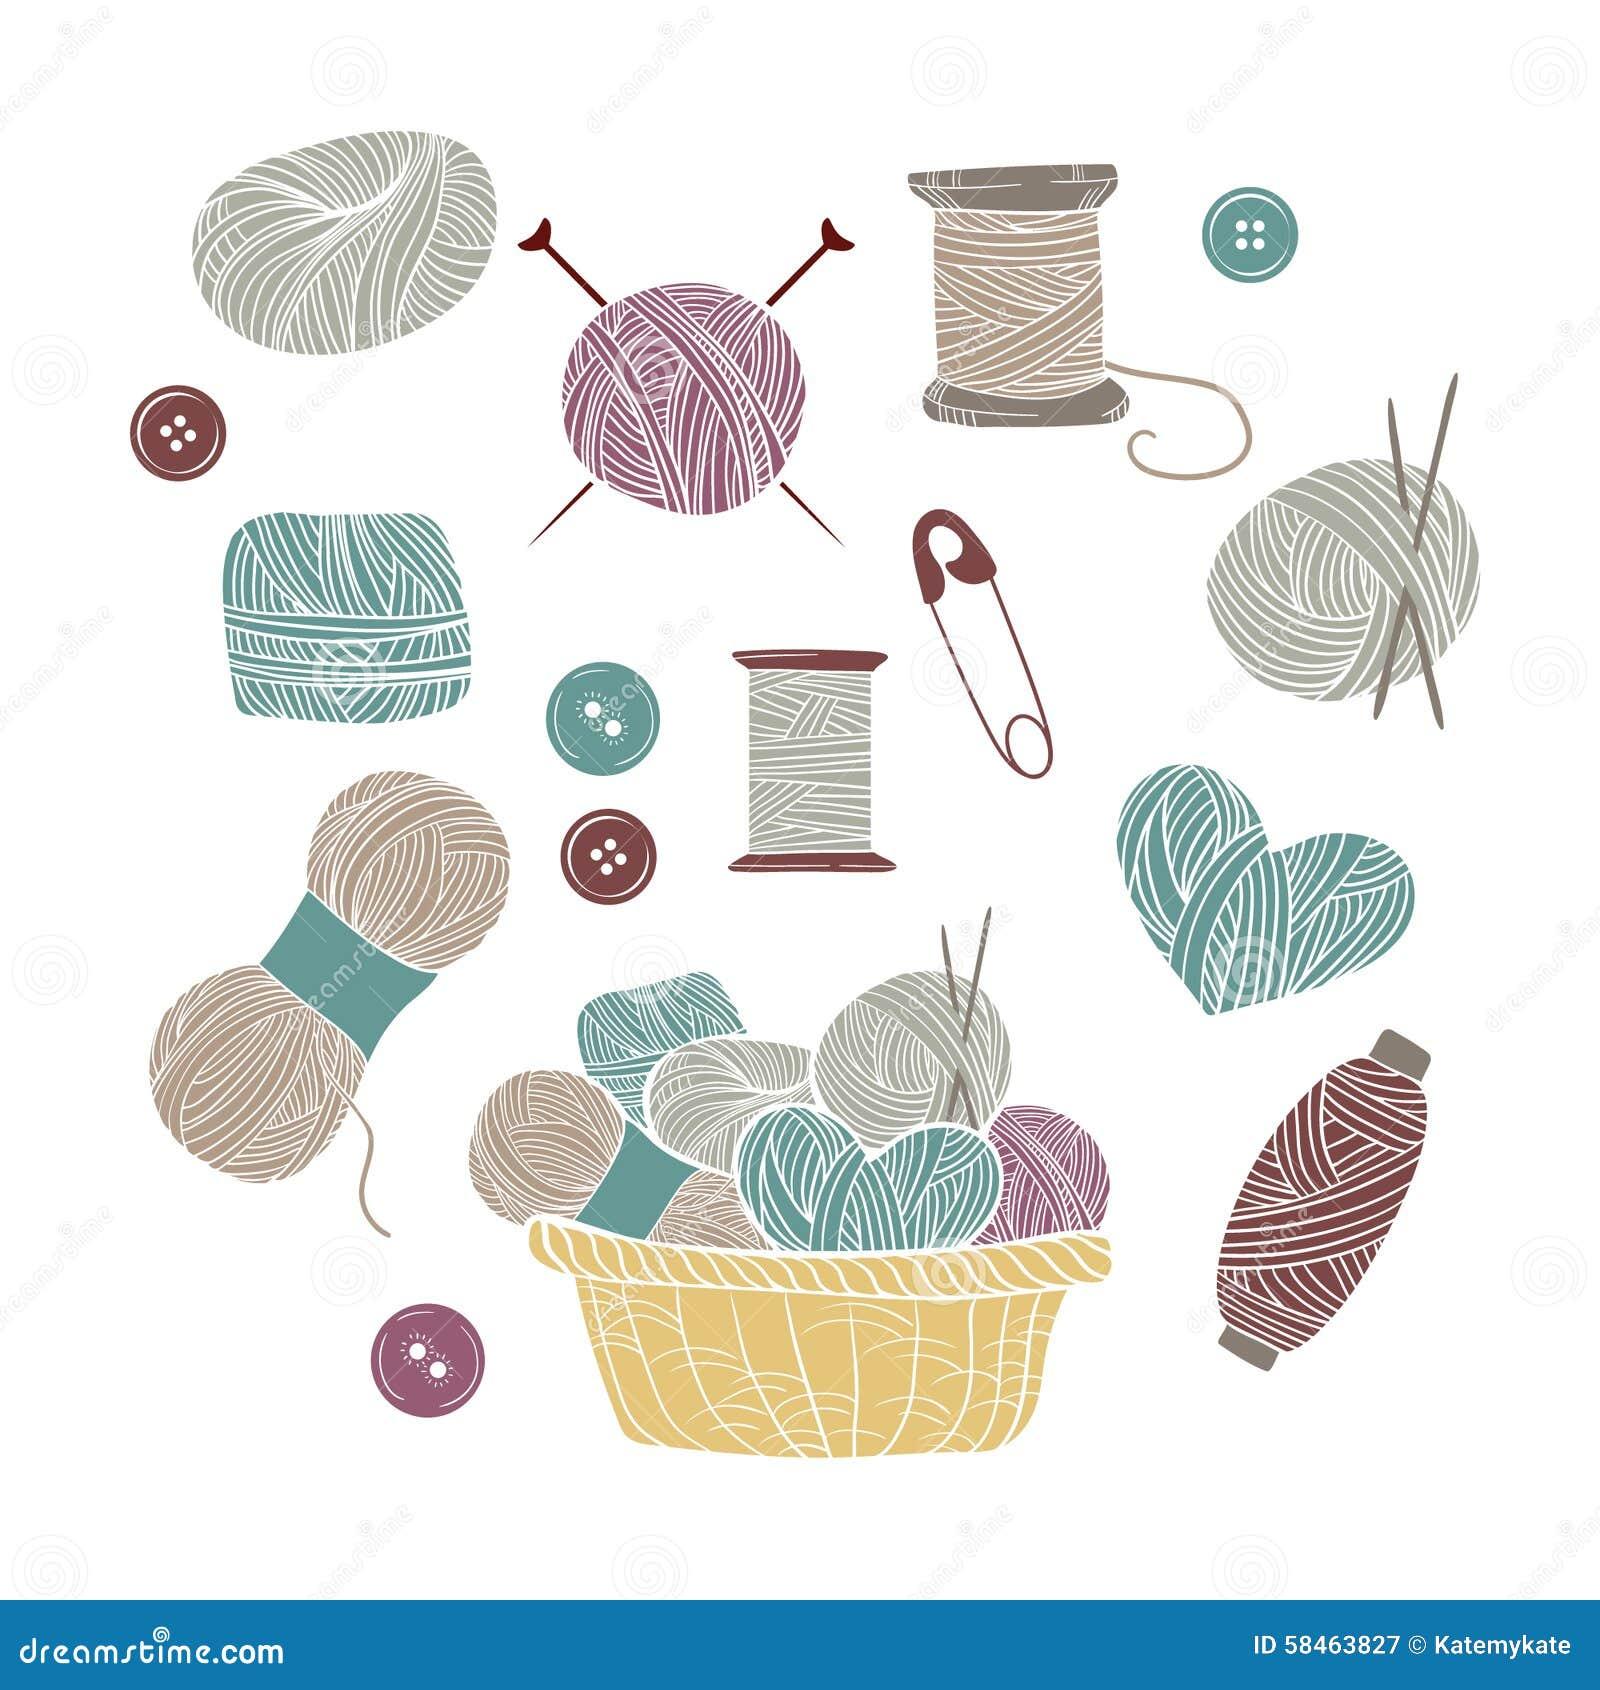 hand drawn vector vintage illustration set of knitting